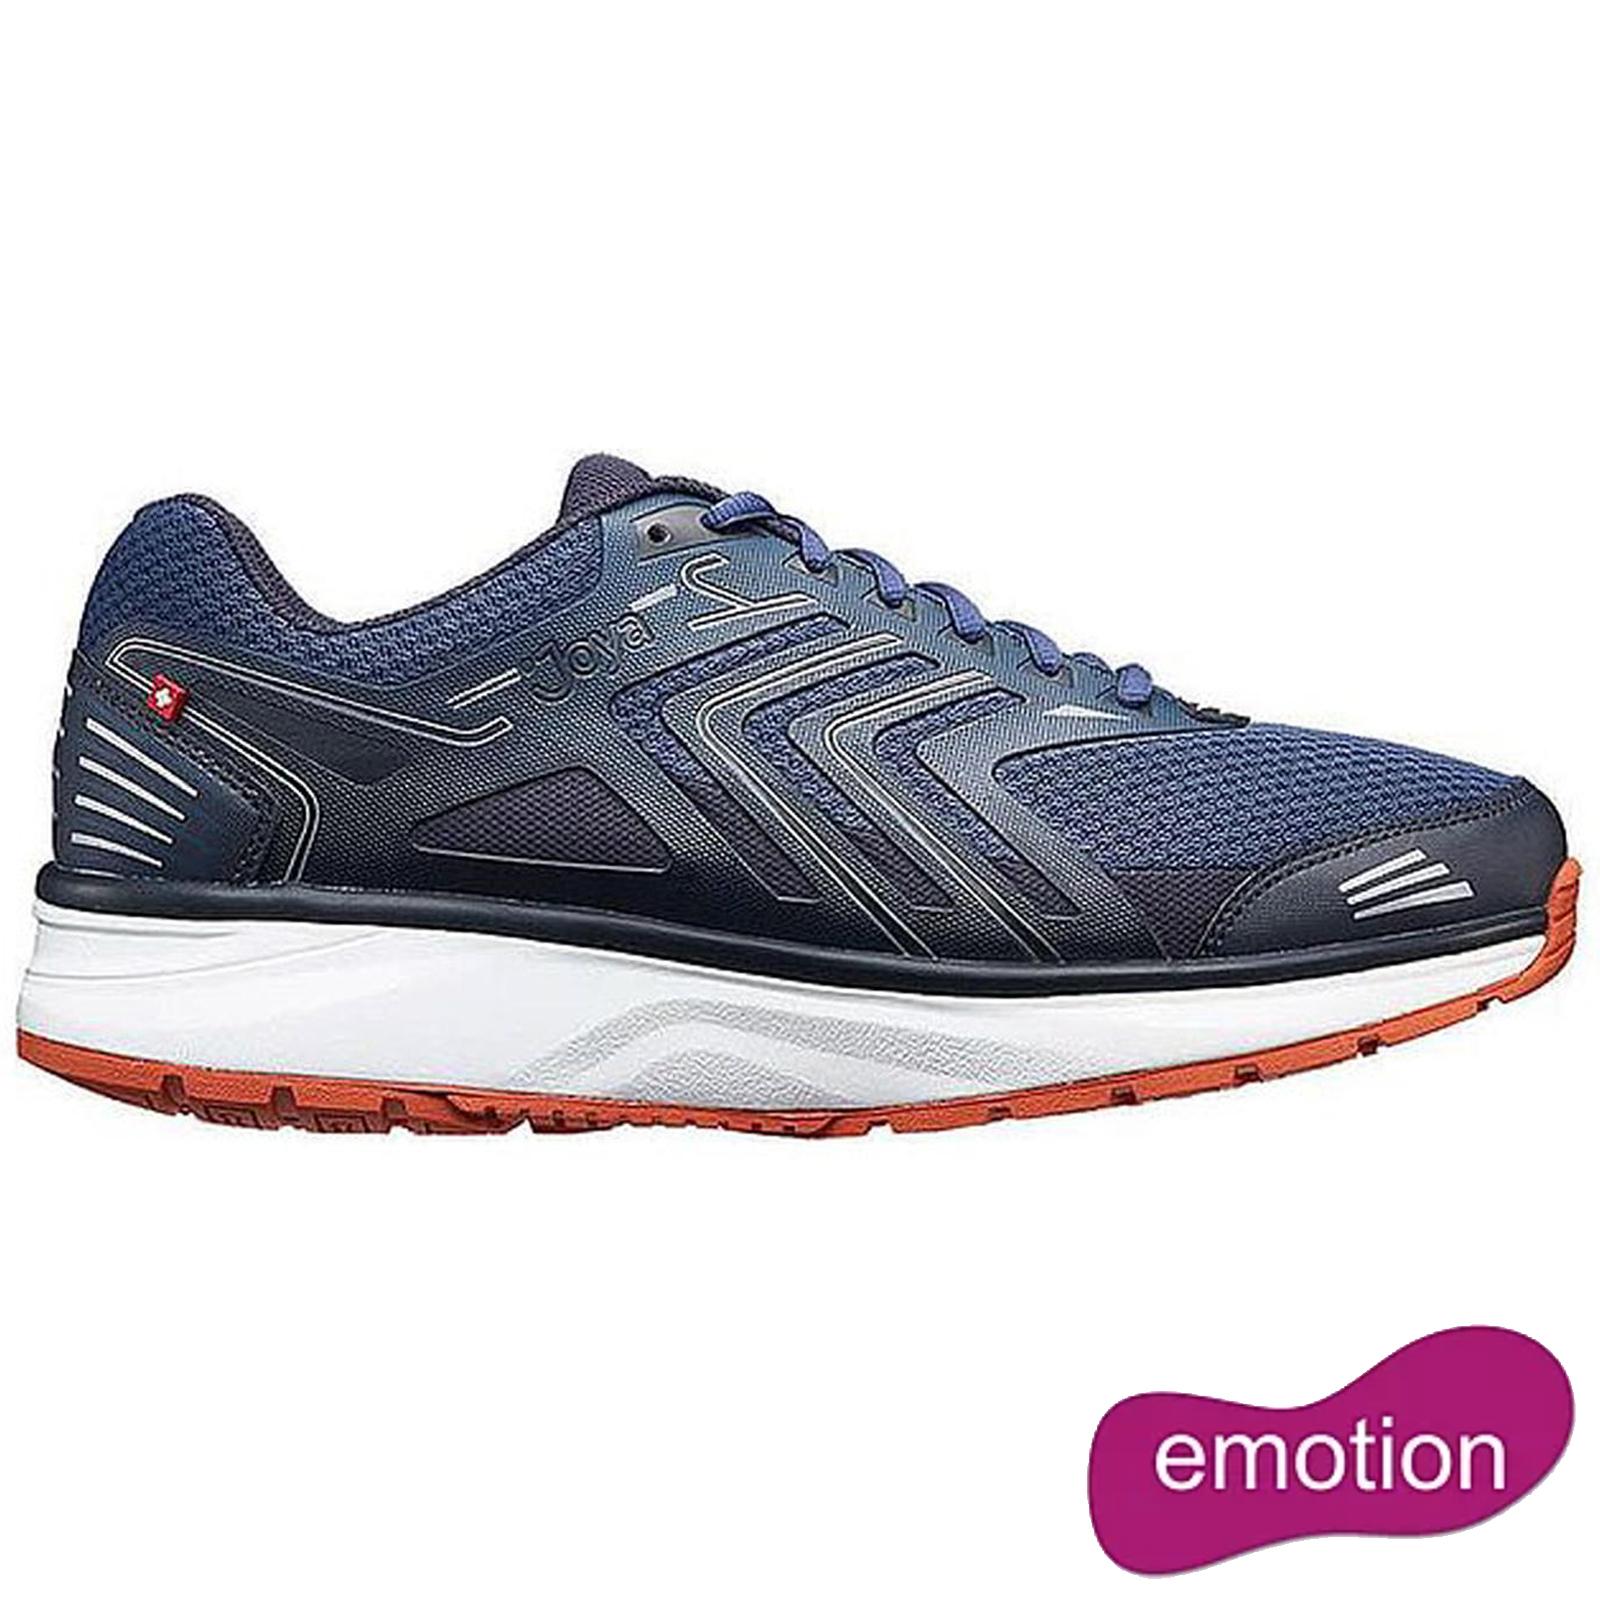 Joya Mens Flash Emotion Trainers Shoes - Dark Blue